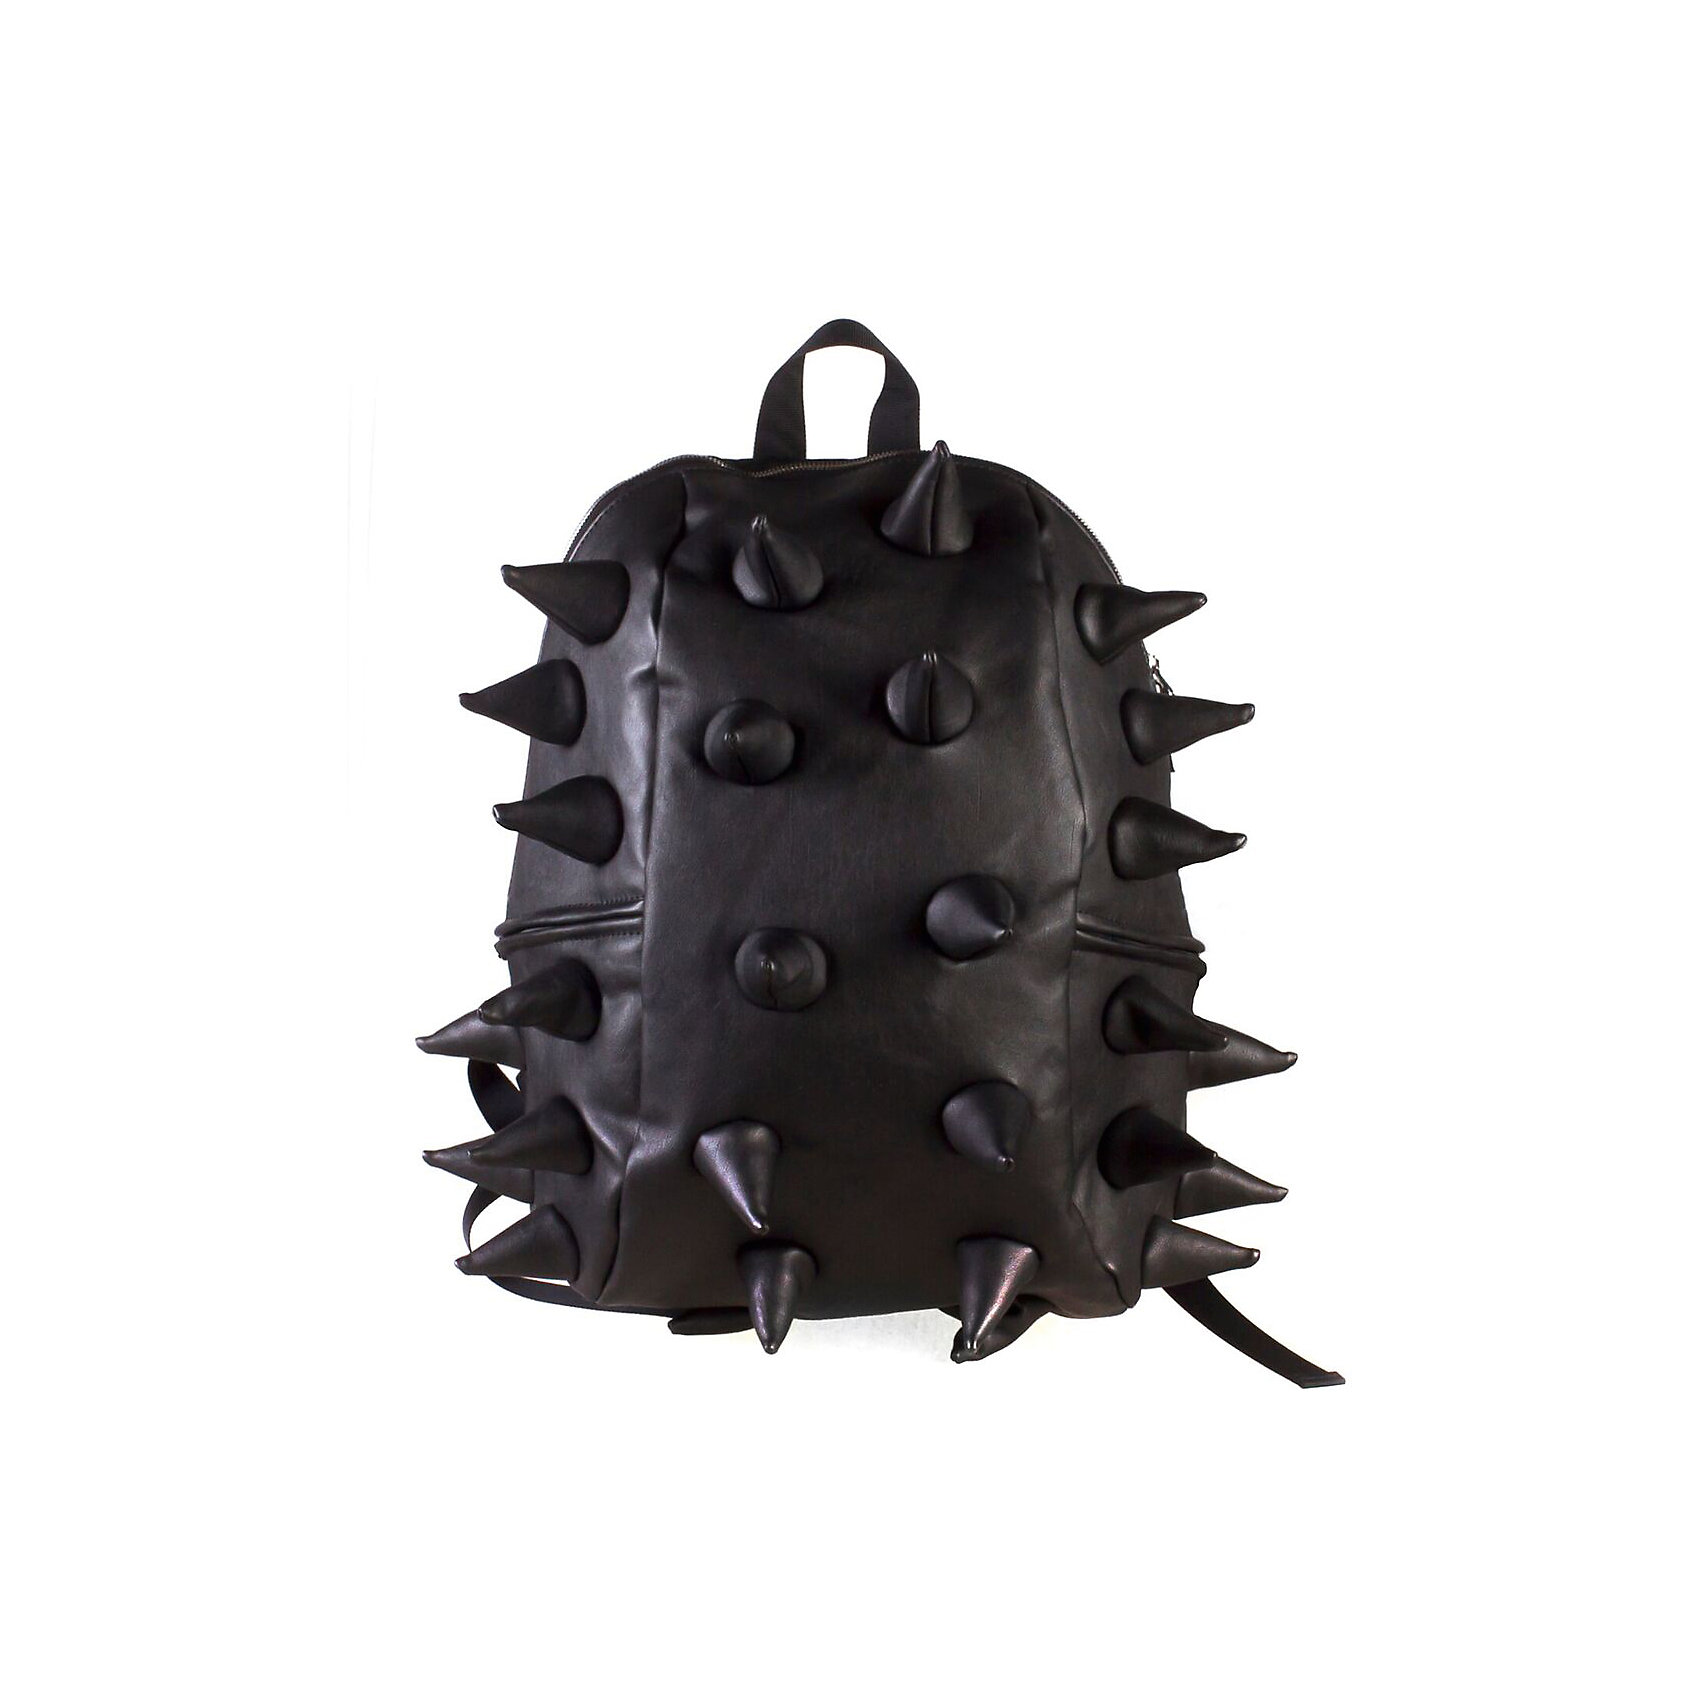 Рюкзак Rex Half Heavy Metal Spike Black, цвет черныйРюкзаки<br>Вес: 0,6 кг<br>Размер: 36х30х15 см<br>Состав: рюкзак<br>Наличие светоотражающих элементов: нет<br>Материал: полиуретан<br><br>Ширина мм: 360<br>Глубина мм: 300<br>Высота мм: 150<br>Вес г: 600<br>Возраст от месяцев: 36<br>Возраст до месяцев: 720<br>Пол: Унисекс<br>Возраст: Детский<br>SKU: 7054103